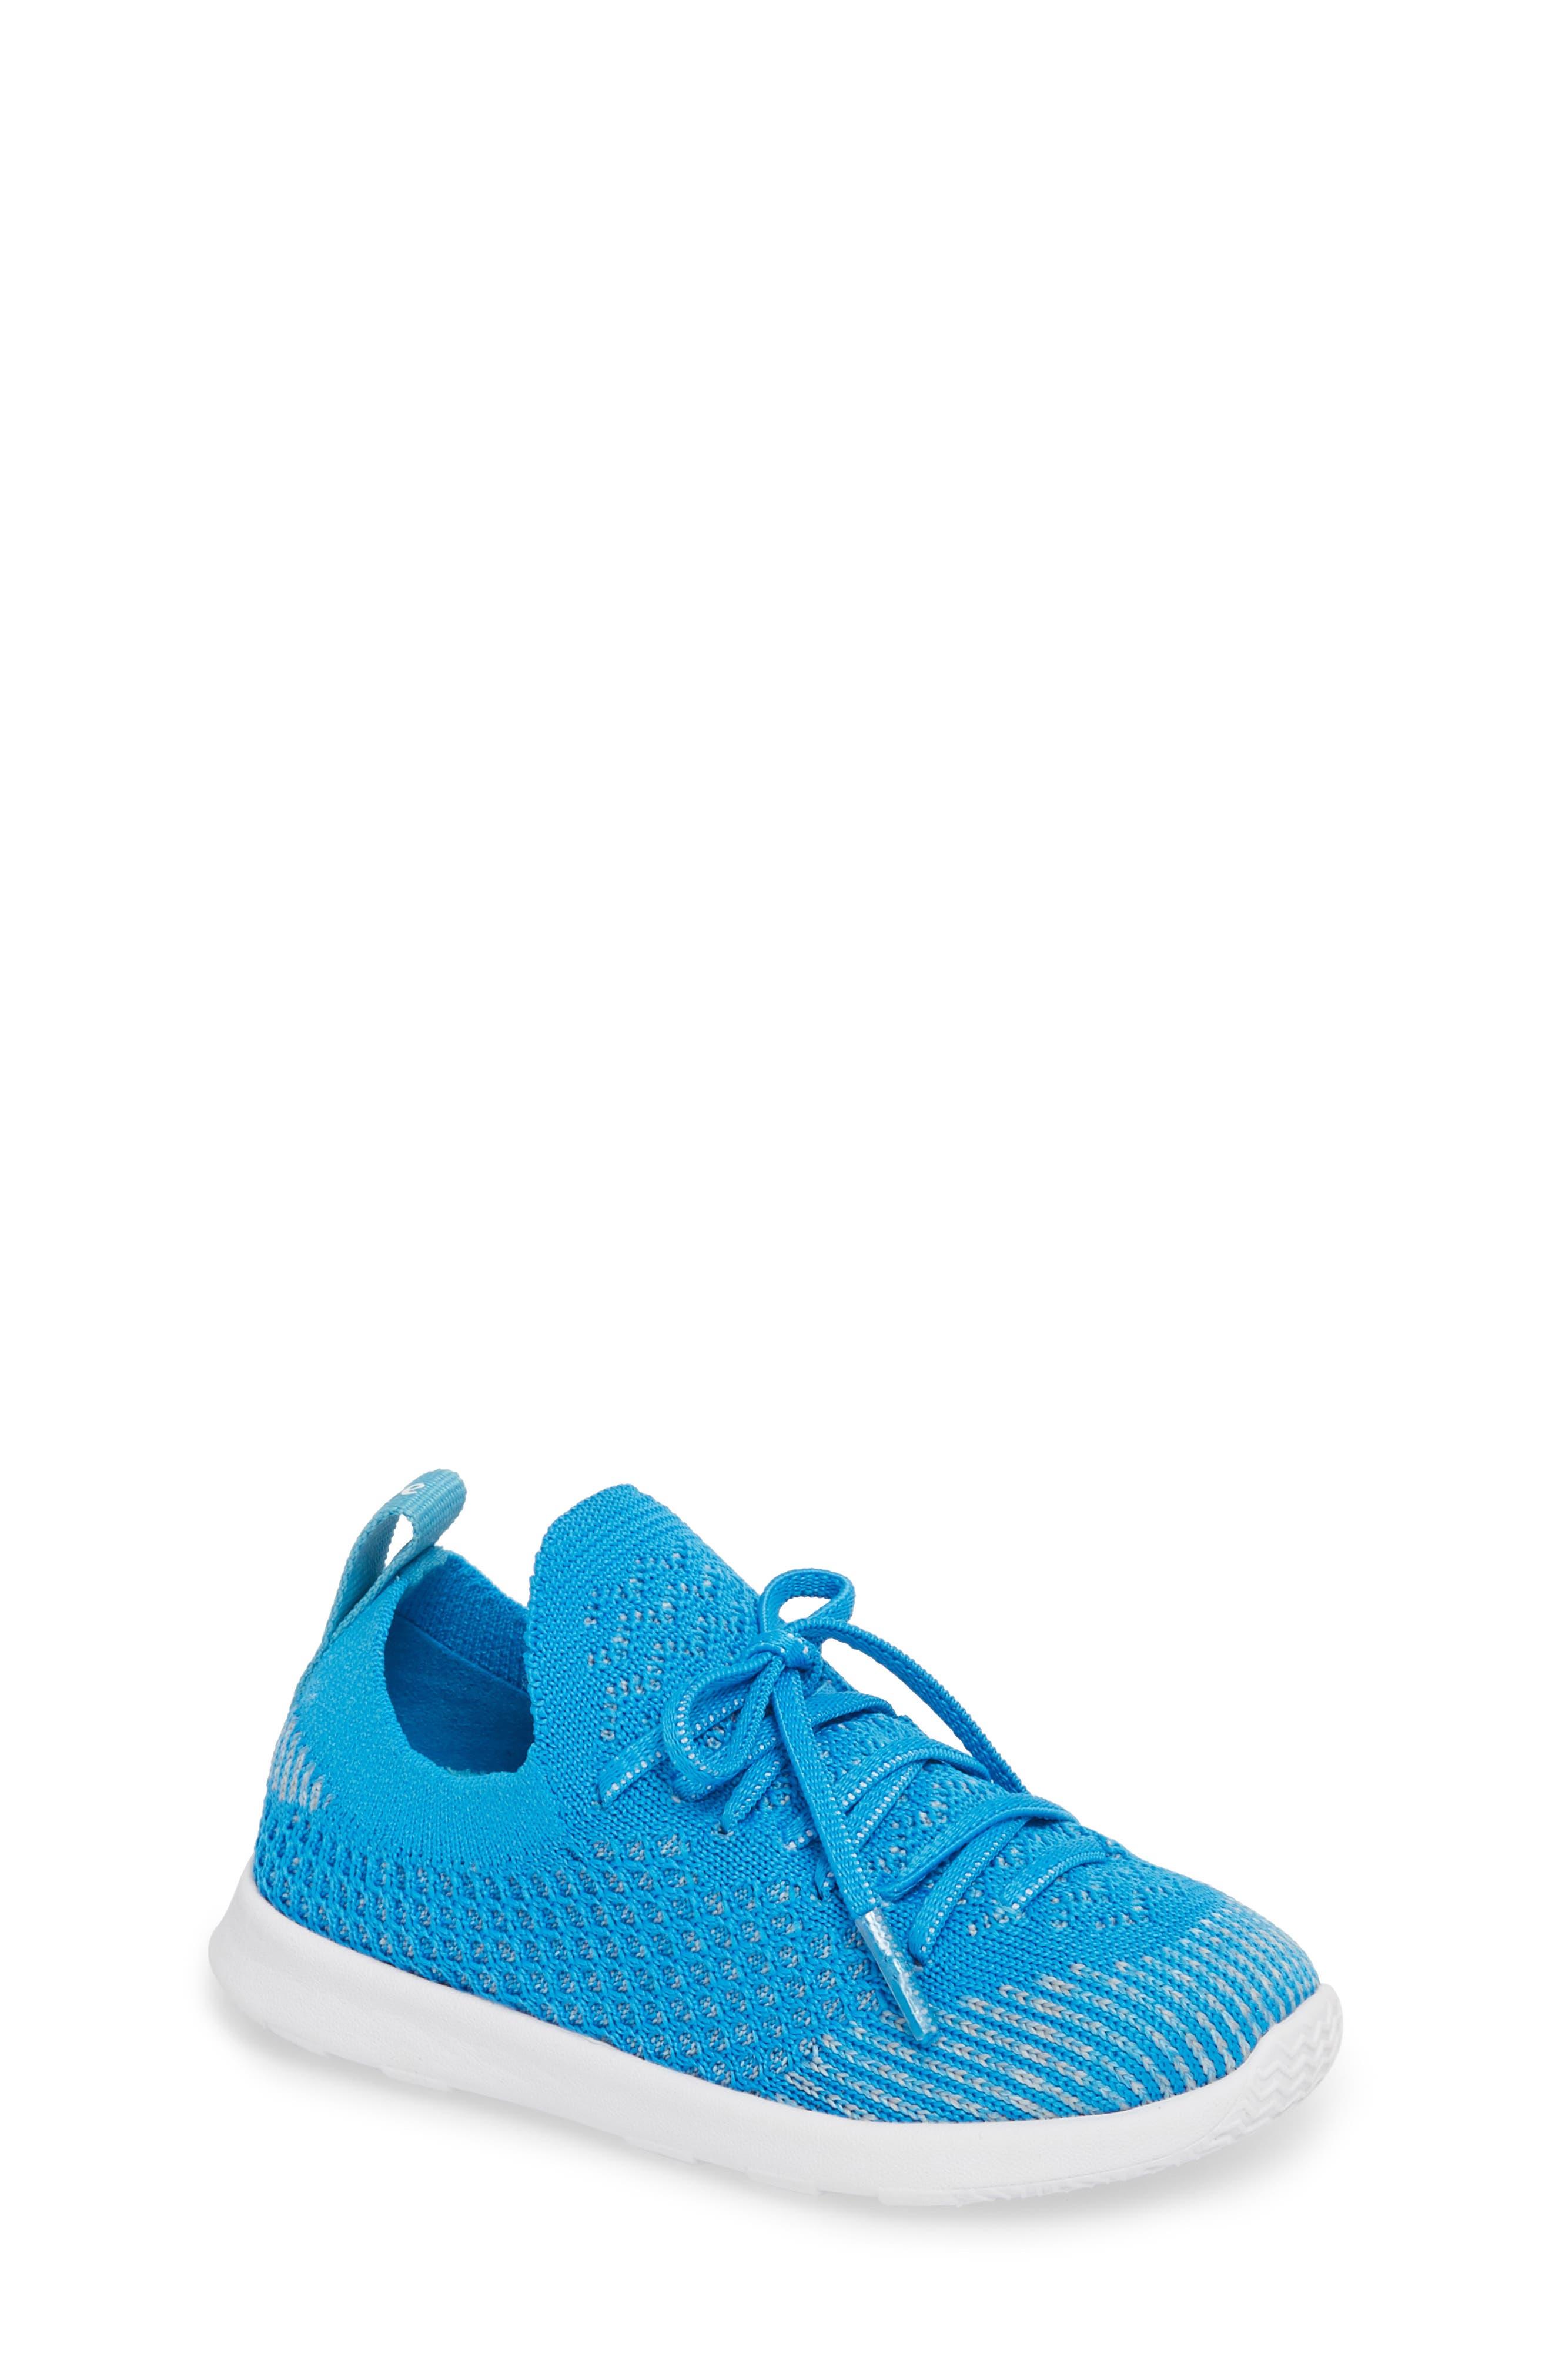 AP Mercury LiteKnit Sneaker,                         Main,                         color, Wave Blue/ Shell White